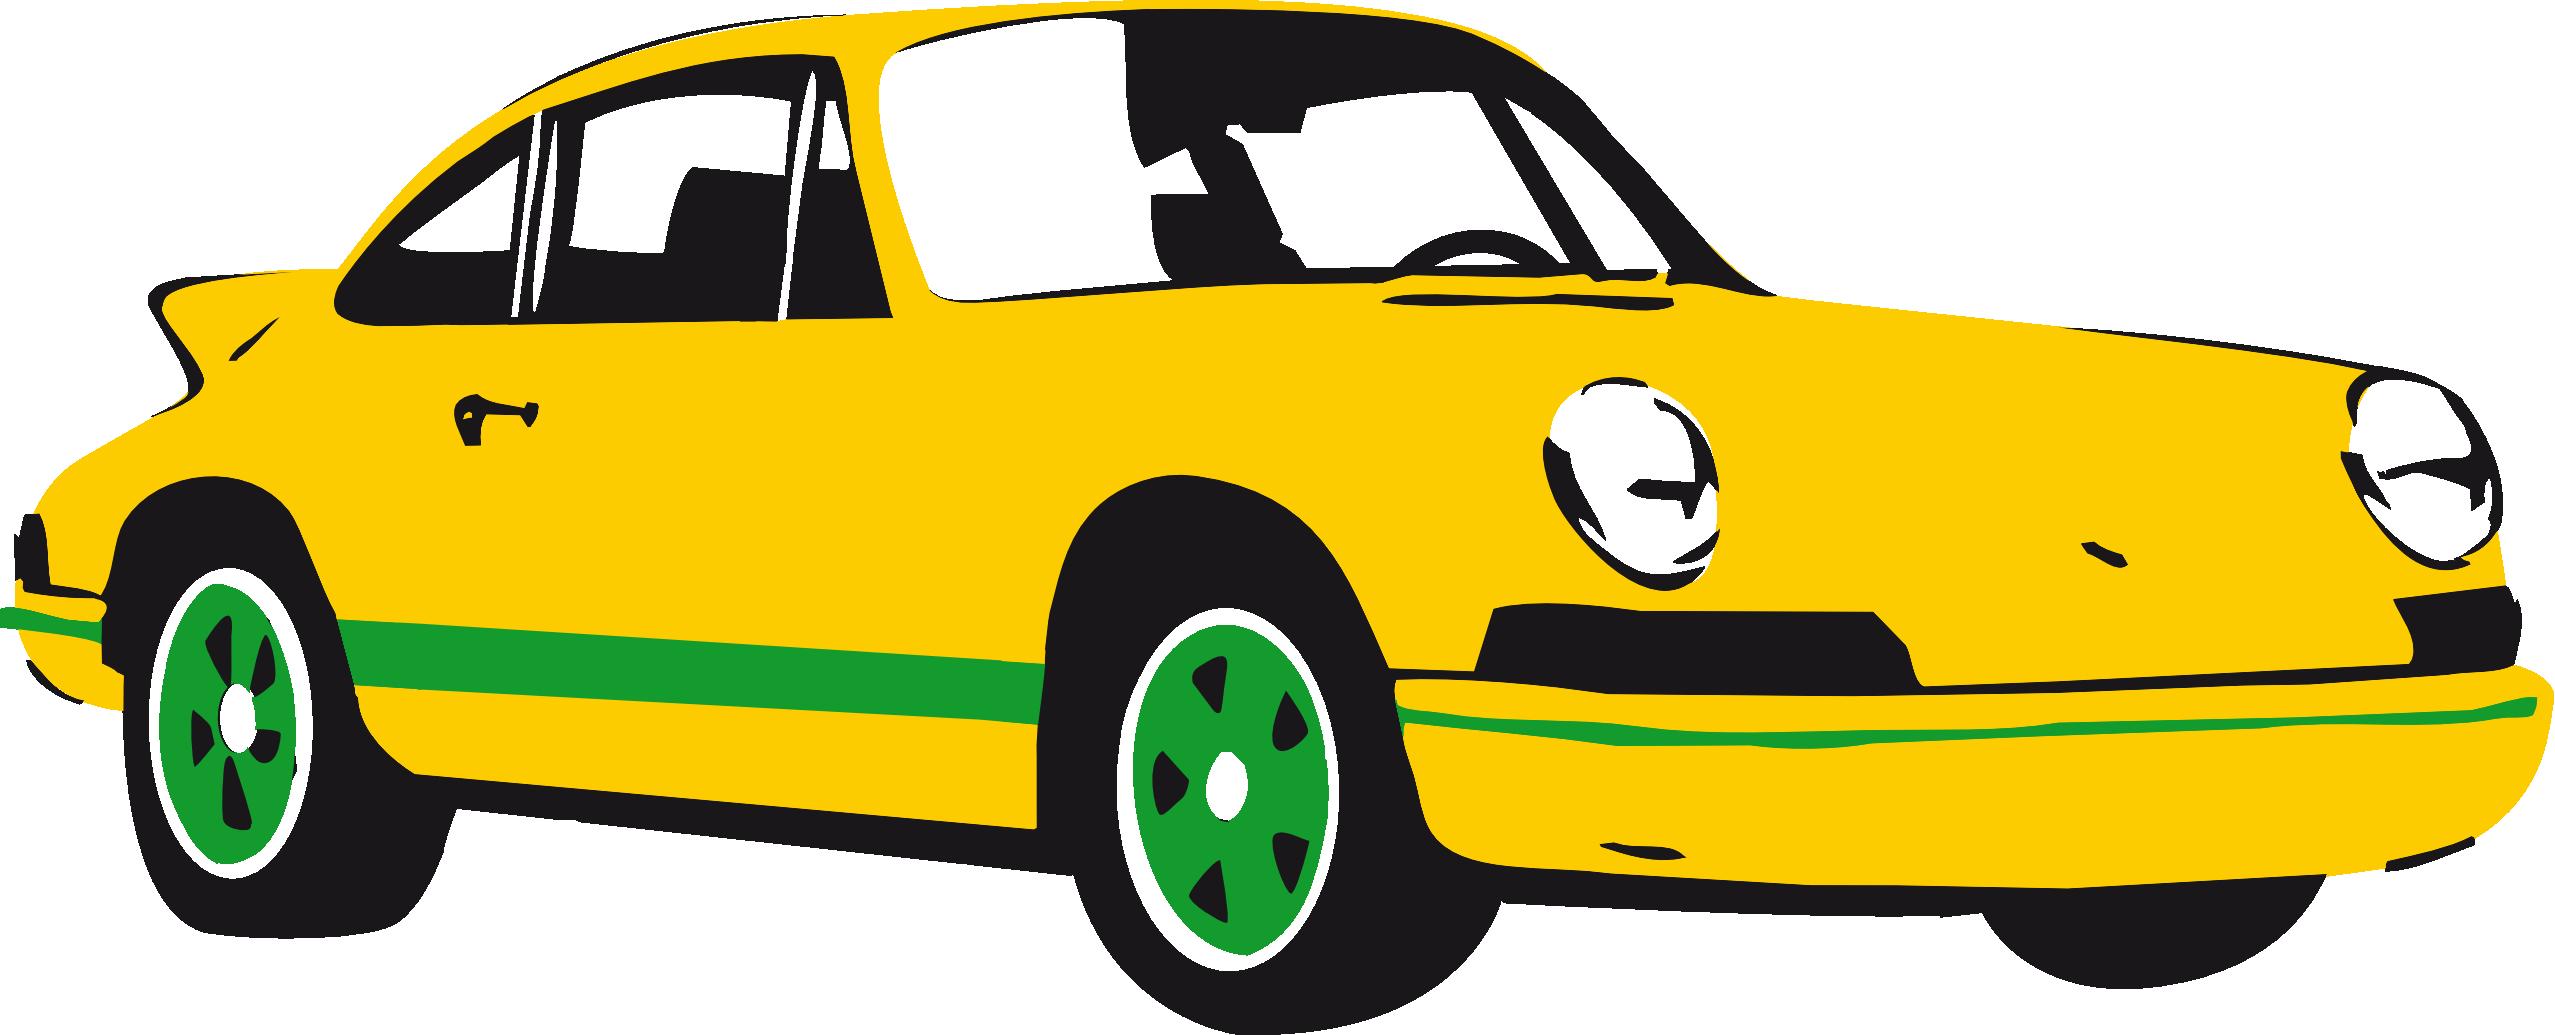 2555x1035 Racing Cartoon Race Car Clipart Clip Art And 2 Wikiclipart